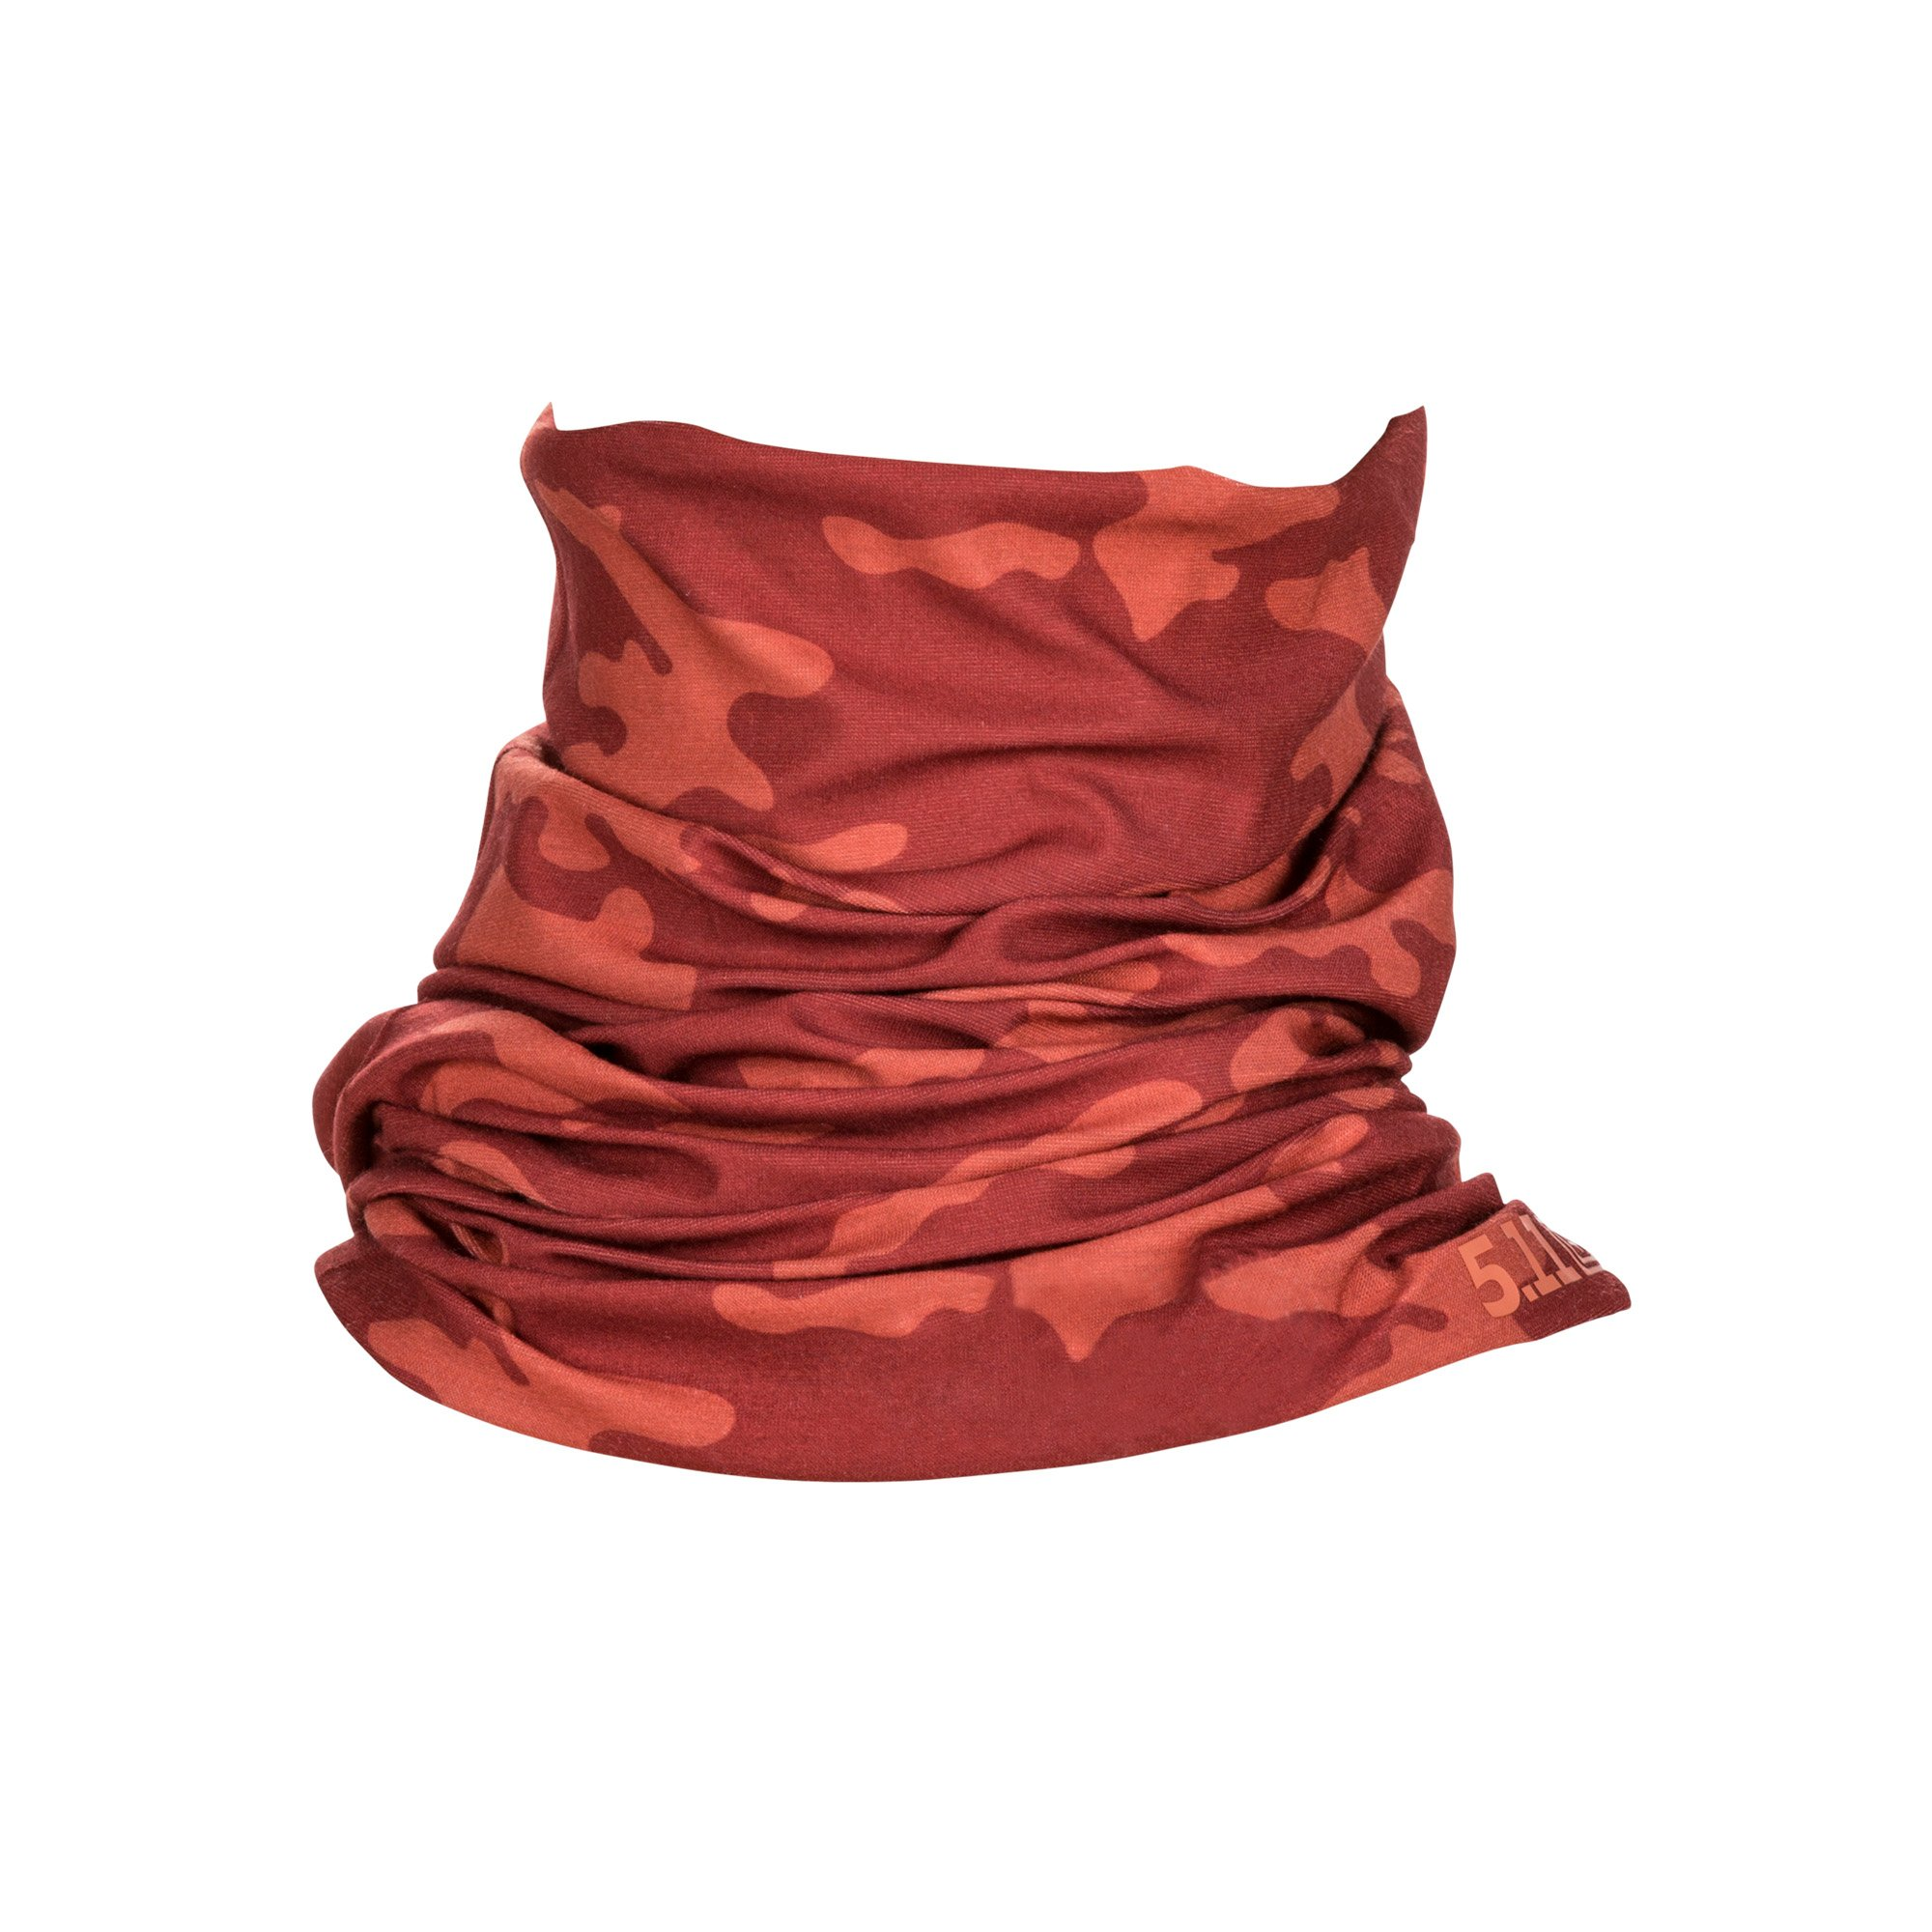 HALO NECK GAITER – Red Sand Camo